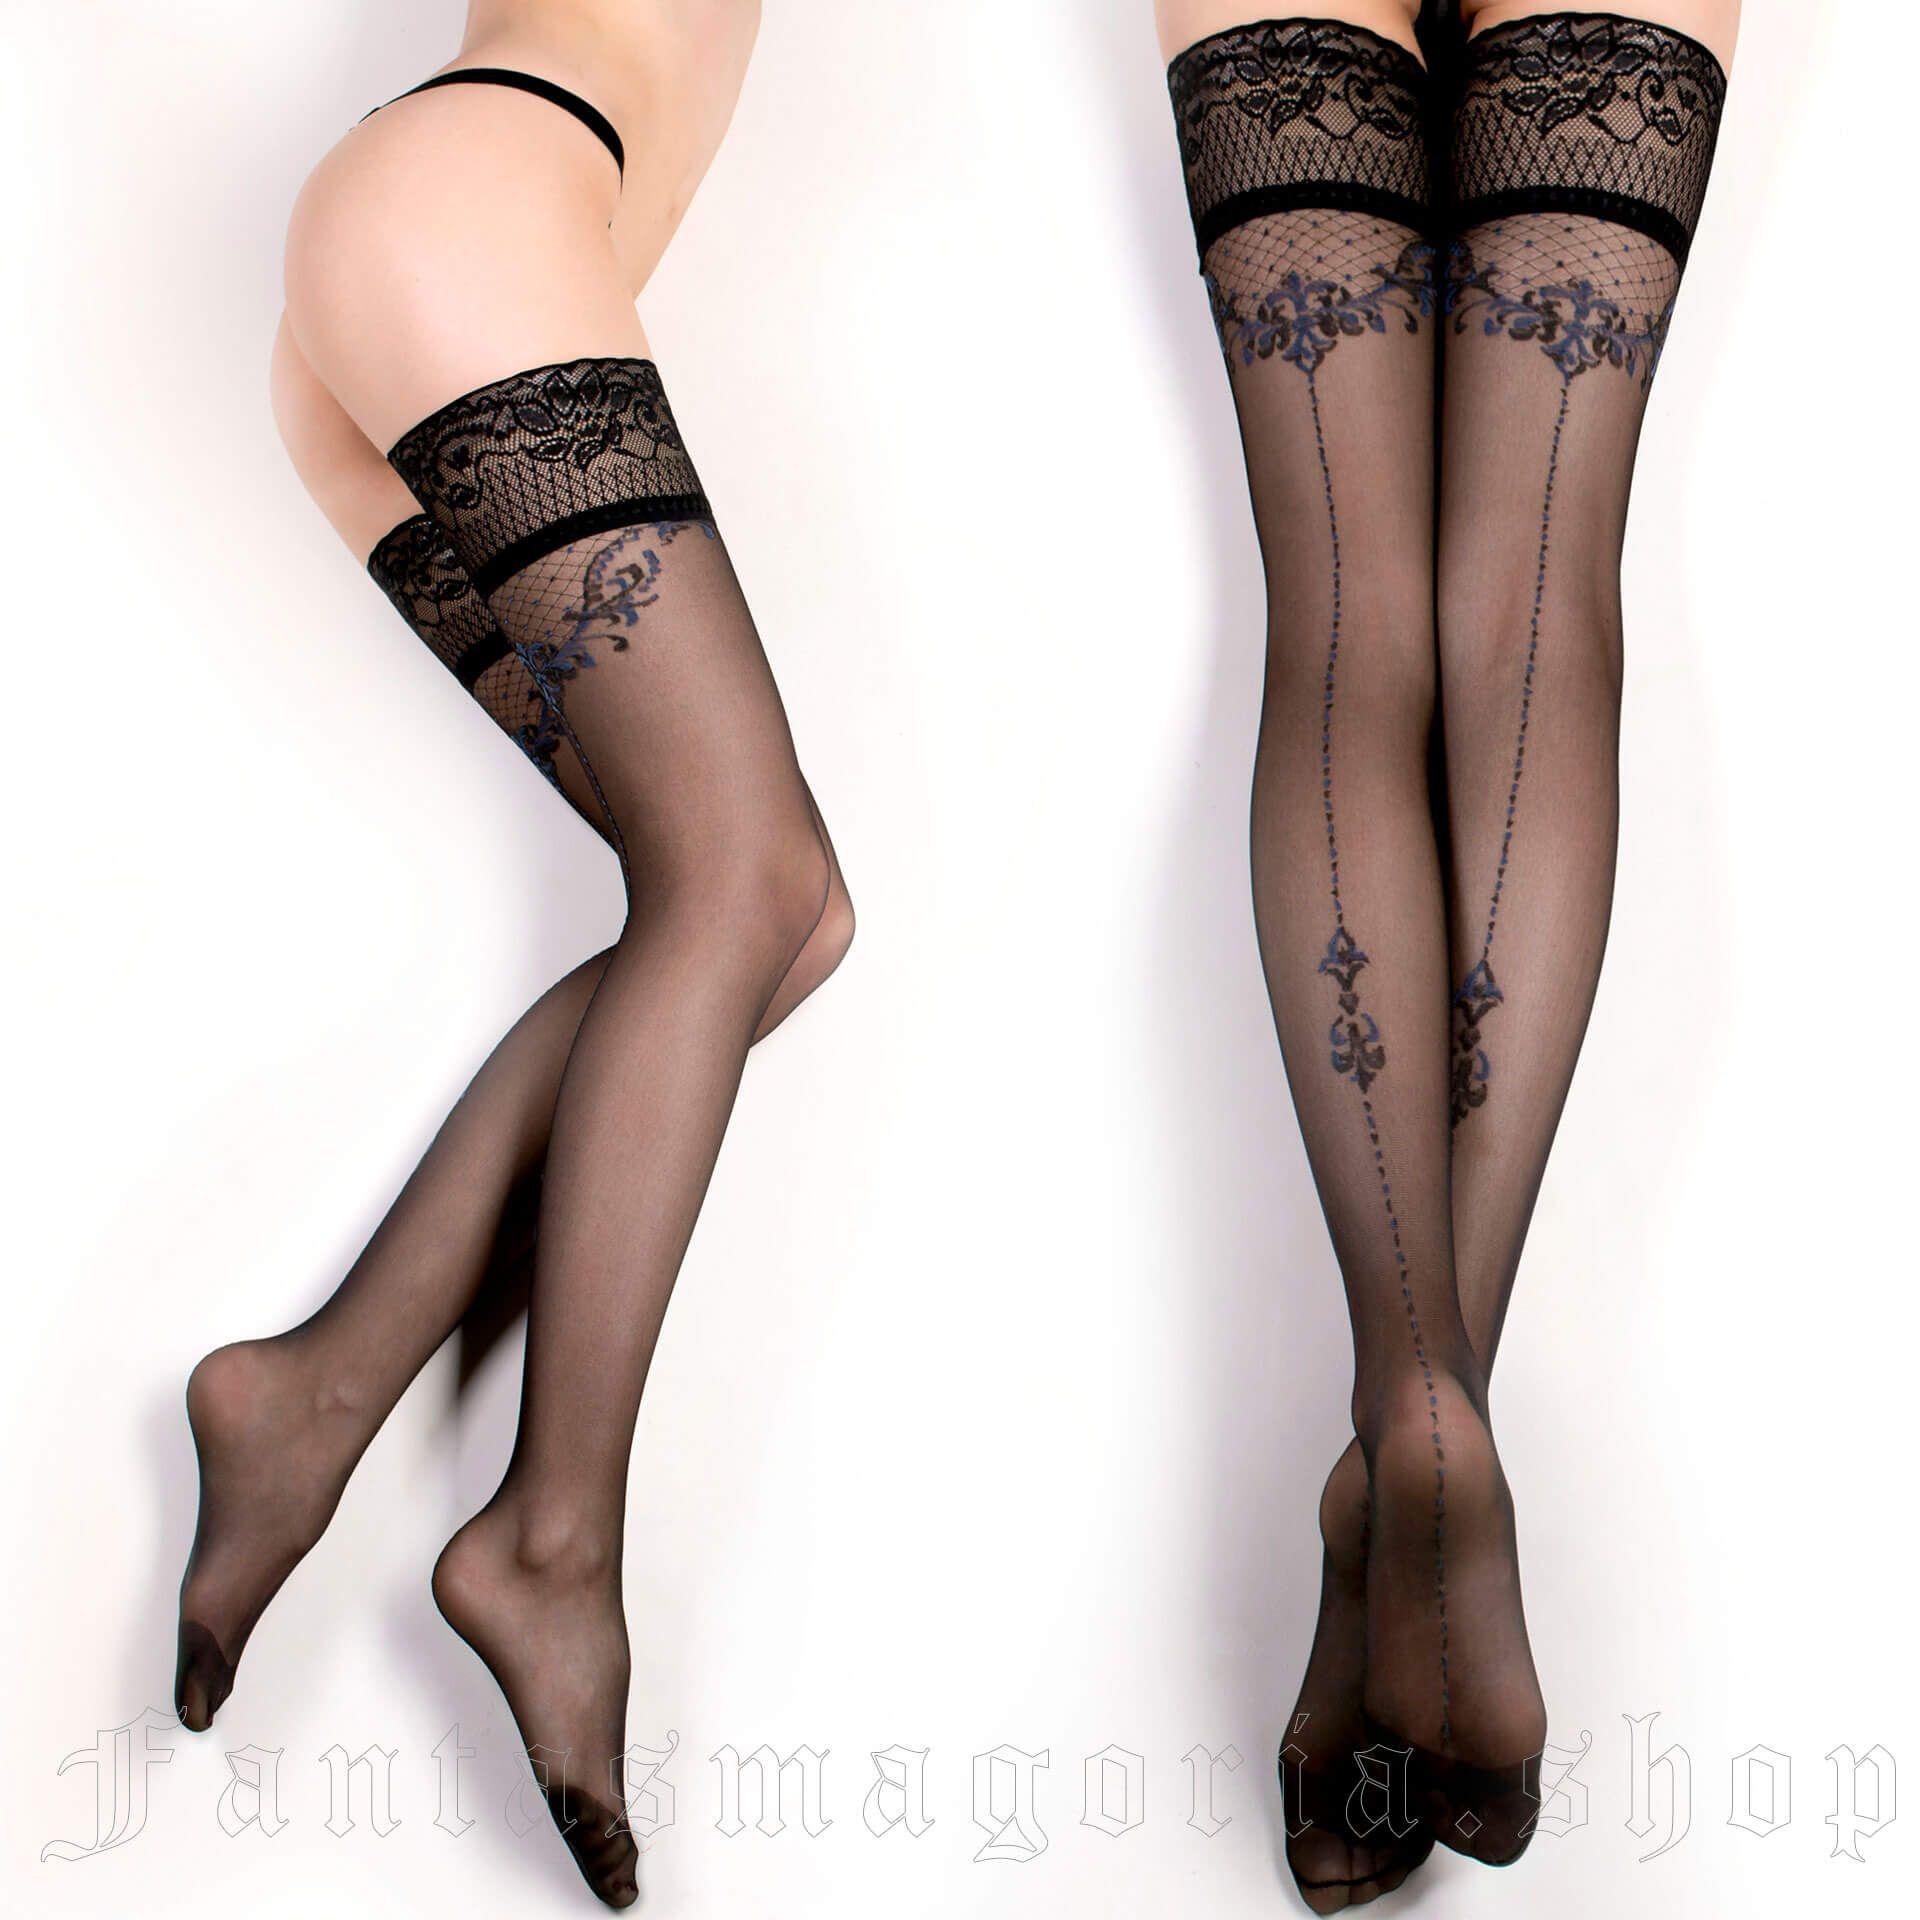 women's Whispers Stockings by BALLERINA brand, code: BAL415